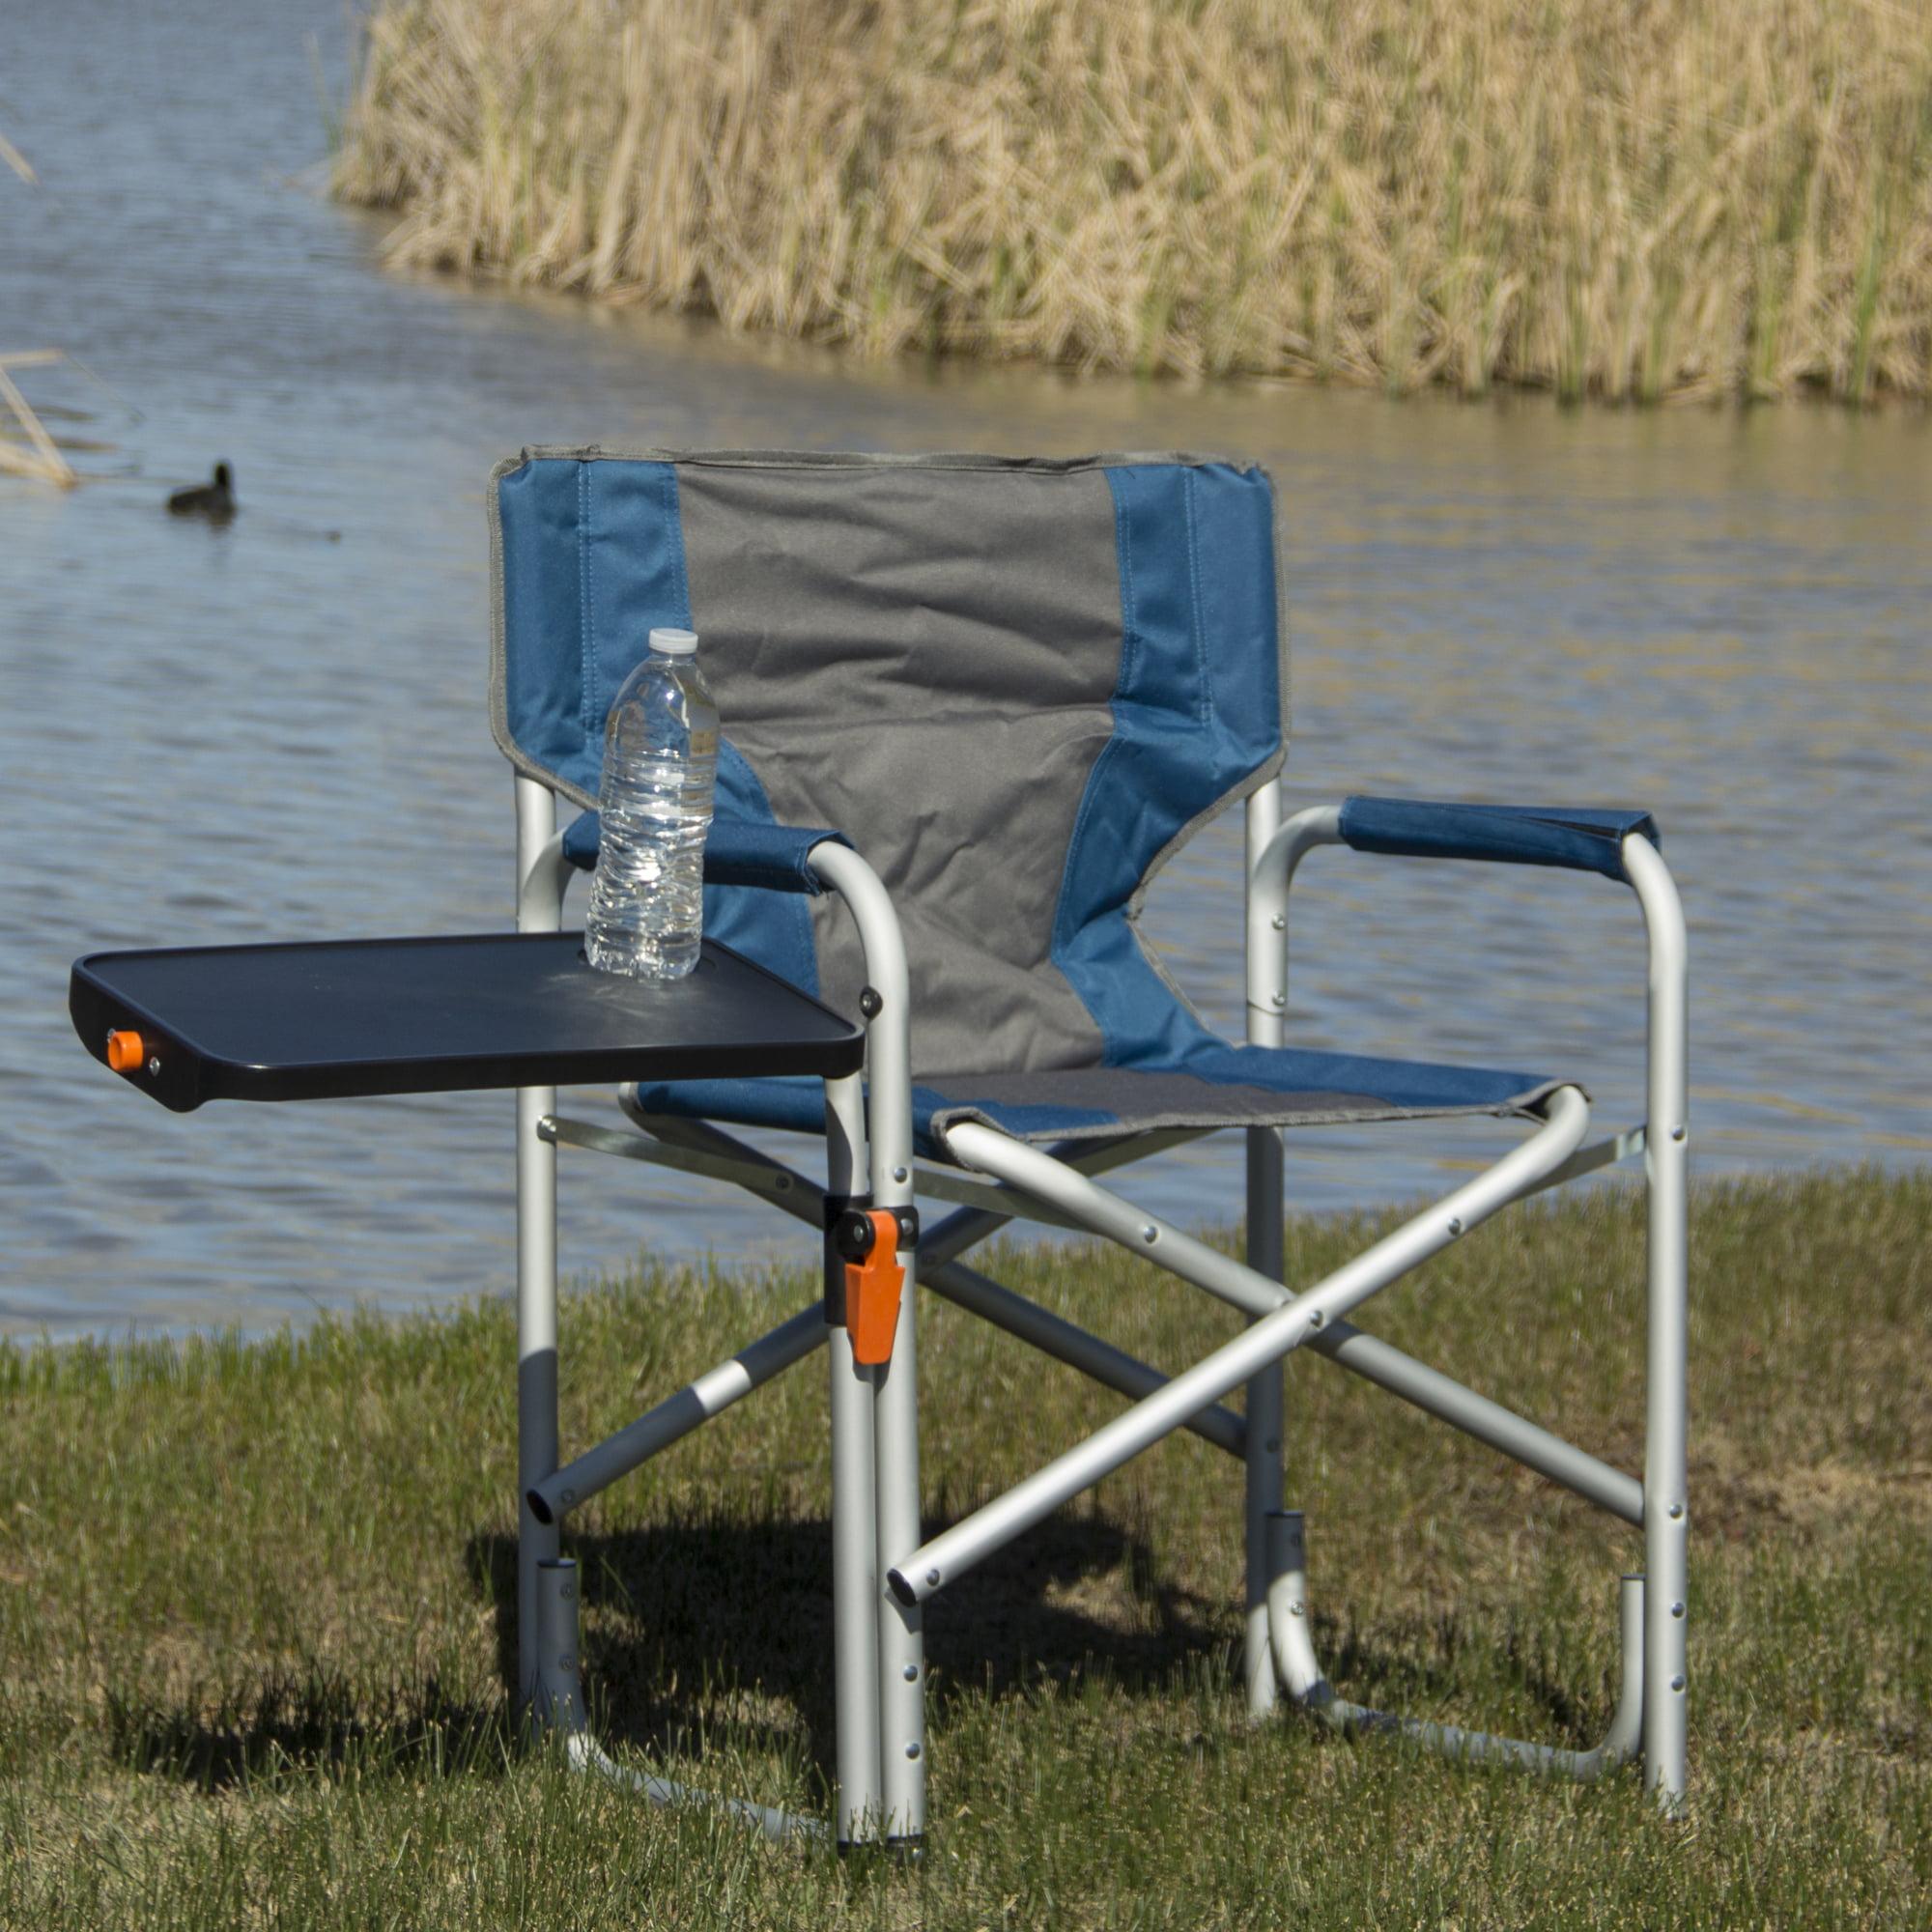 Beautiful Folding Aluminum Lawn Chairs Contrabanda Folding Chaise